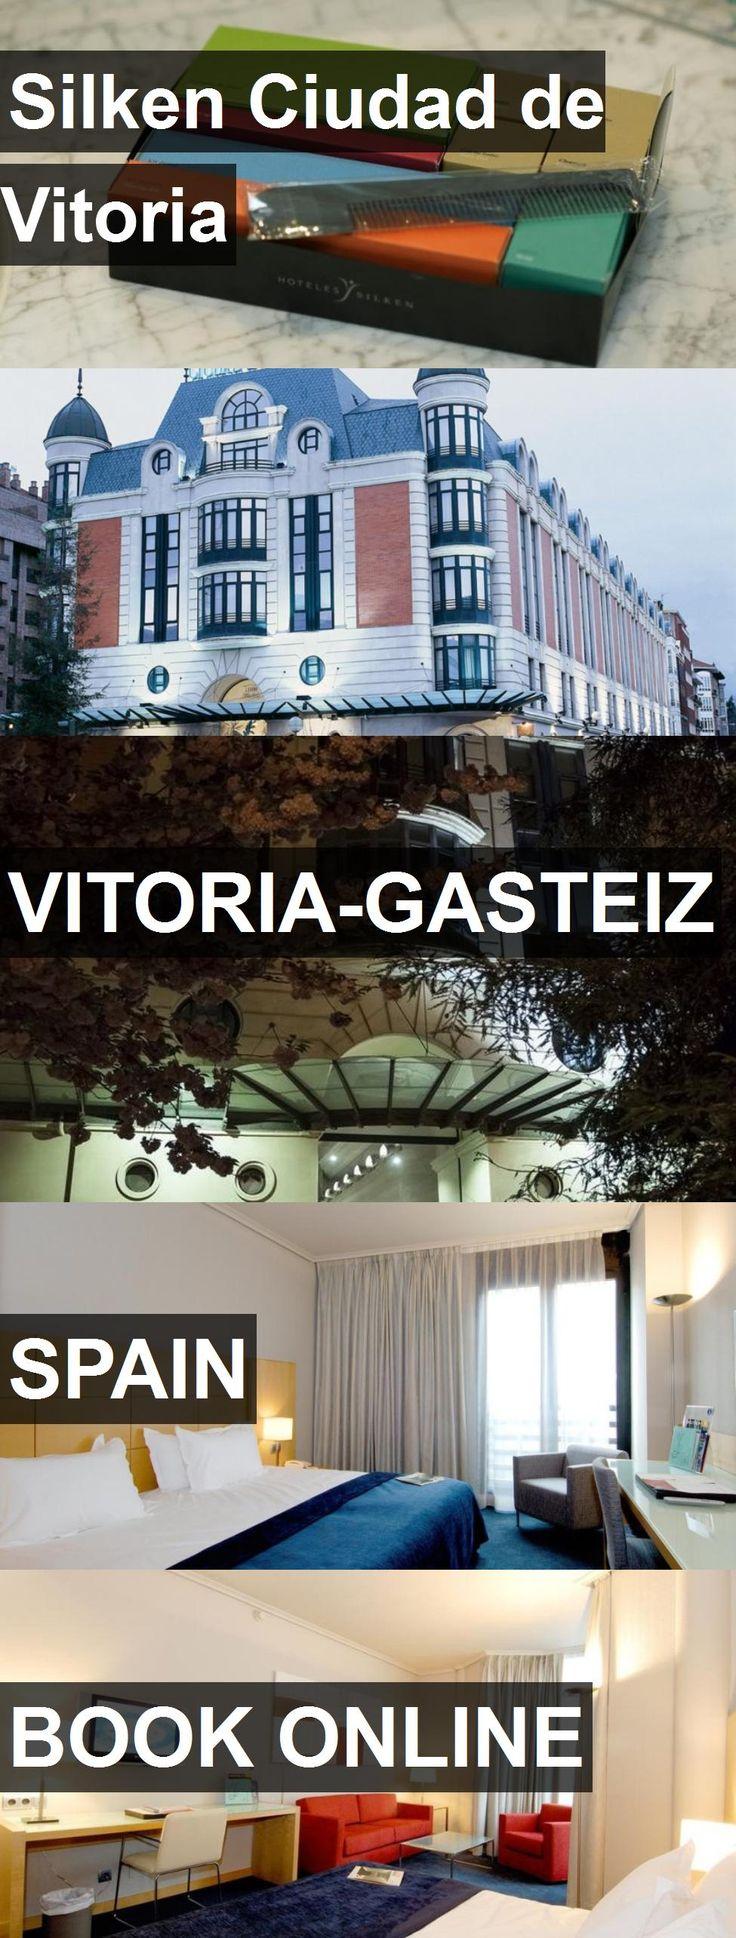 Hotel Silken Ciudad de Vitoria in Vitoria-Gasteiz, Spain. For more information, photos, reviews and best prices please follow the link. #Spain #Vitoria-Gasteiz #travel #vacation #hotel